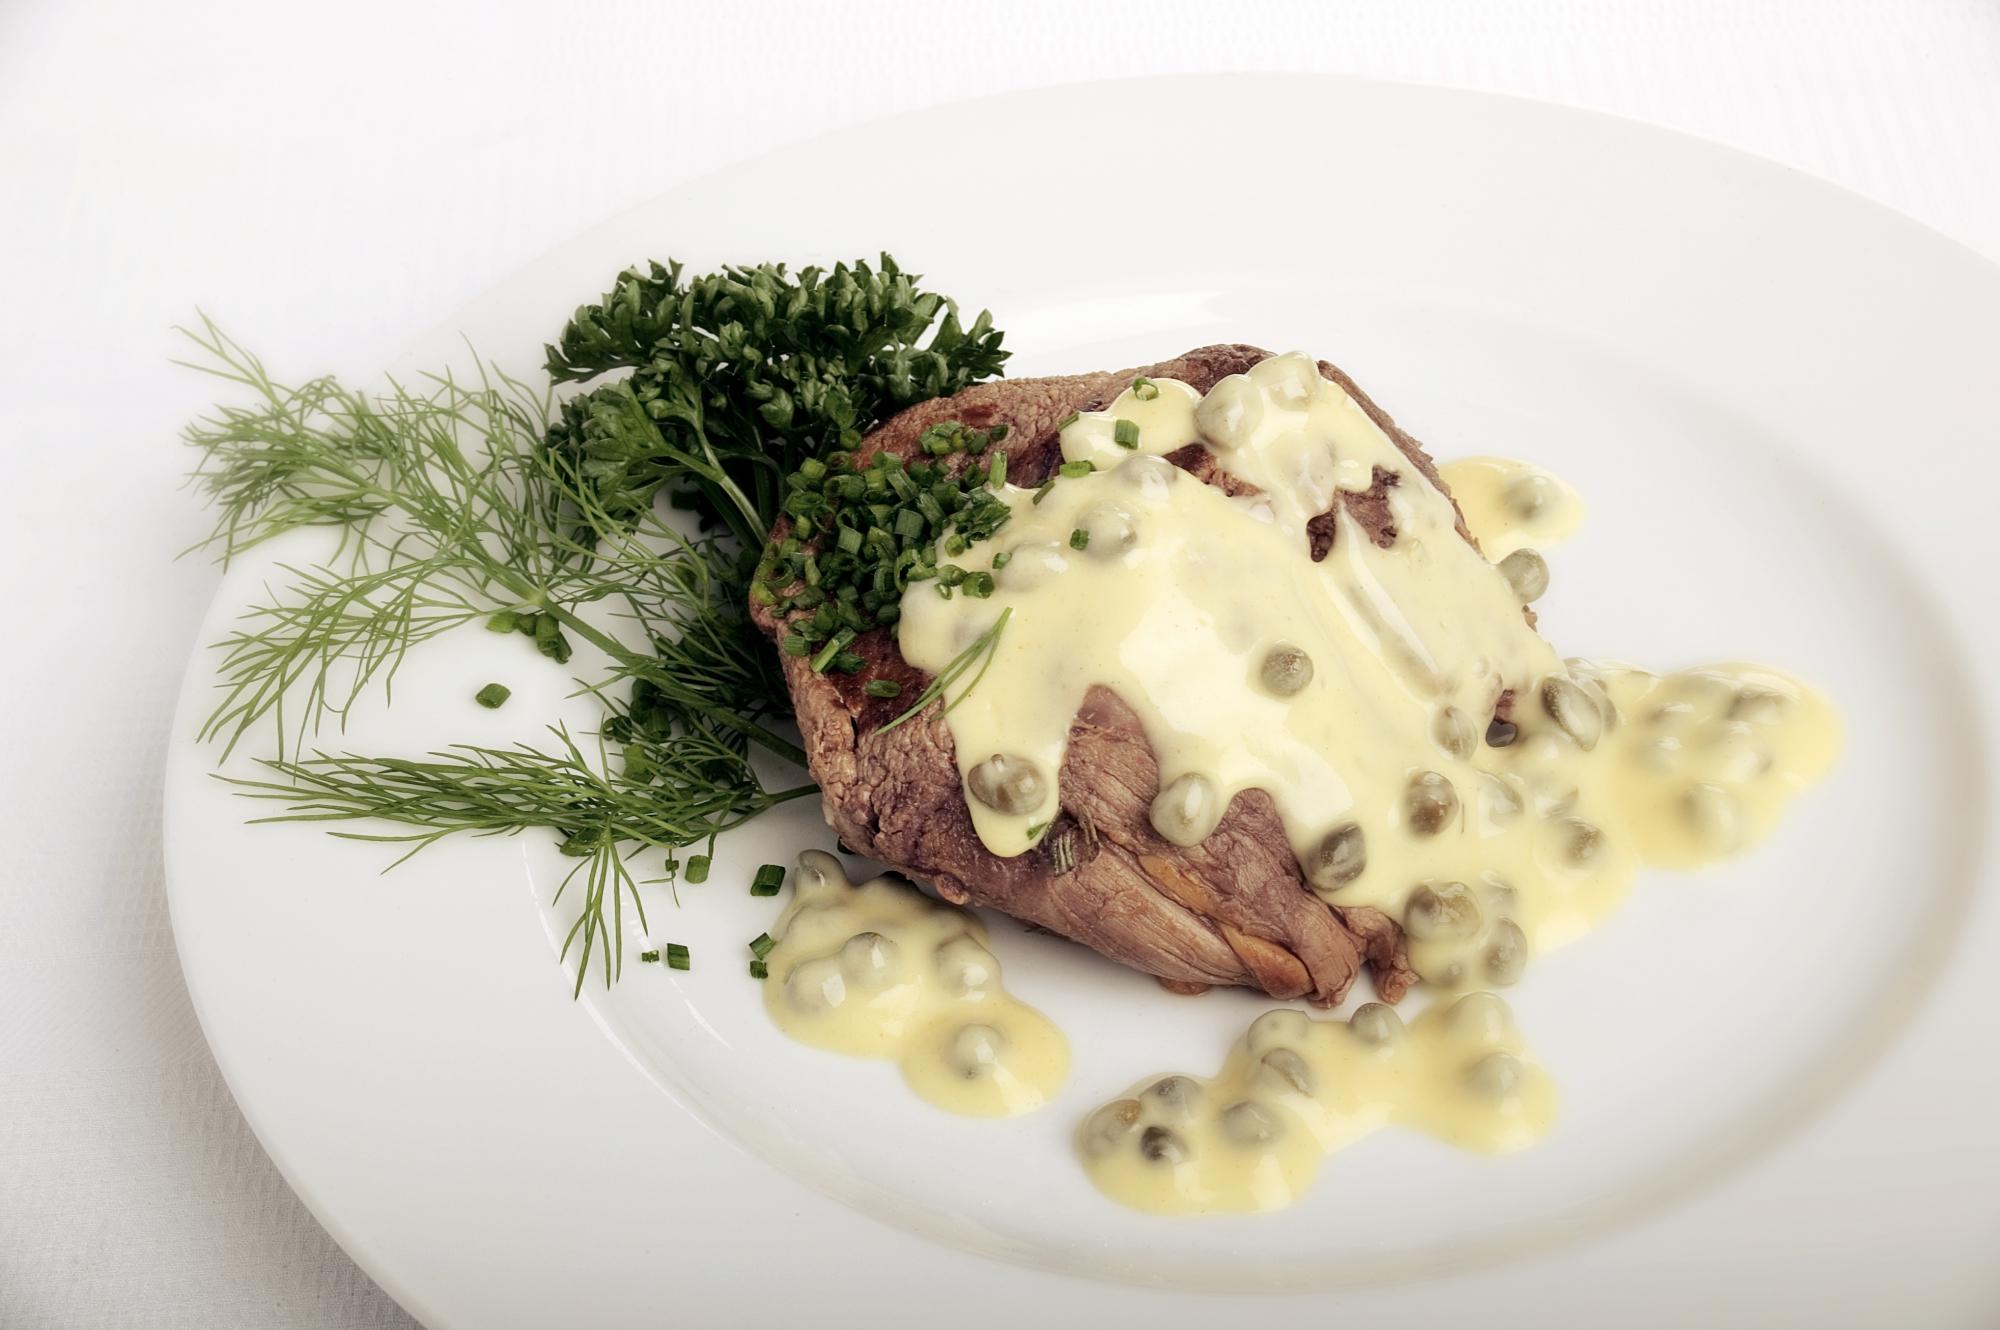 Filet Mignon med peberkorn- og sennepssauce